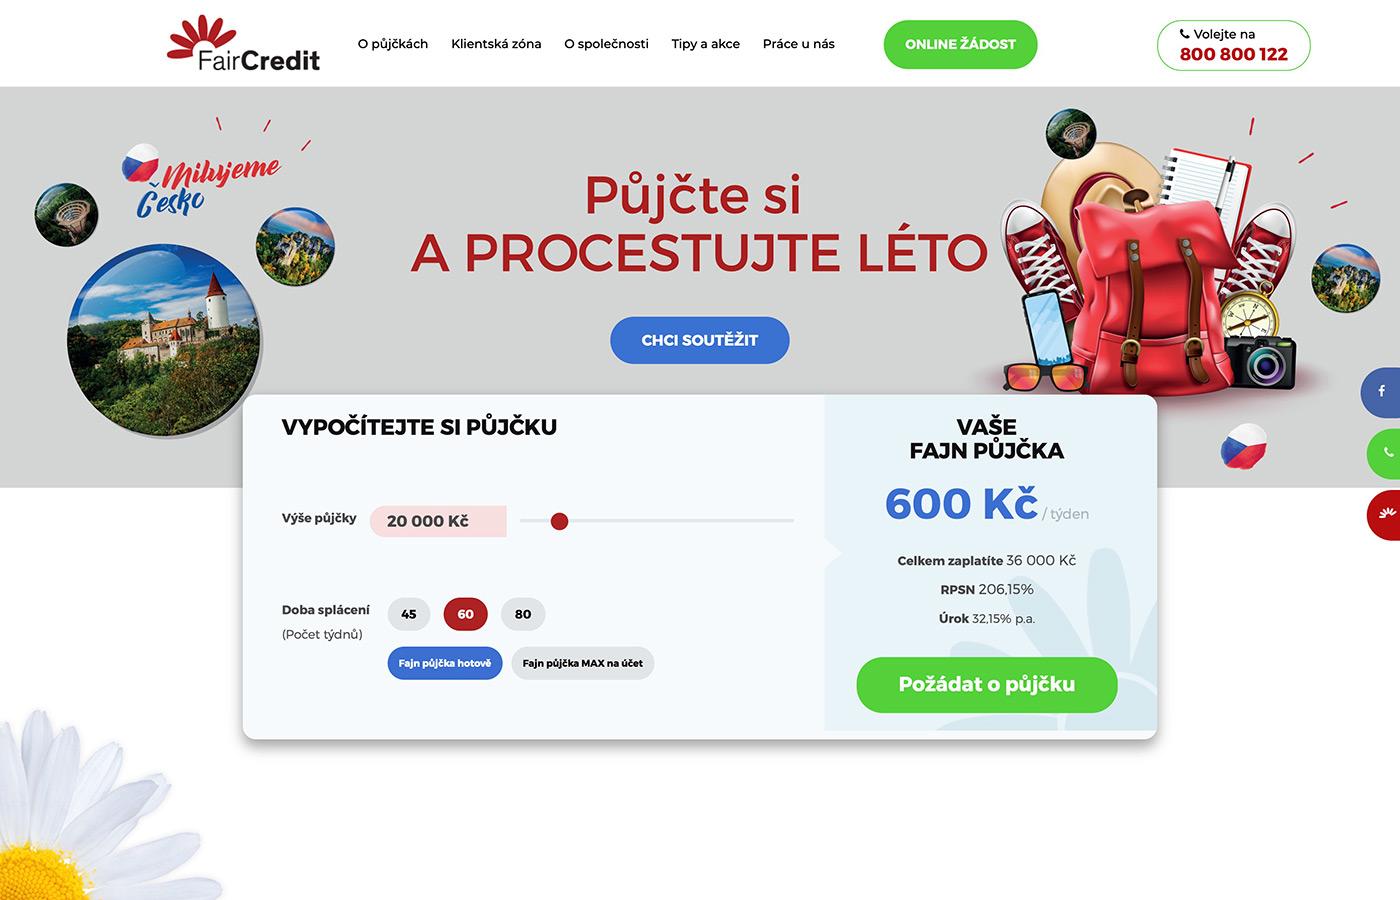 Náhled webu https://www.faircredit.cz